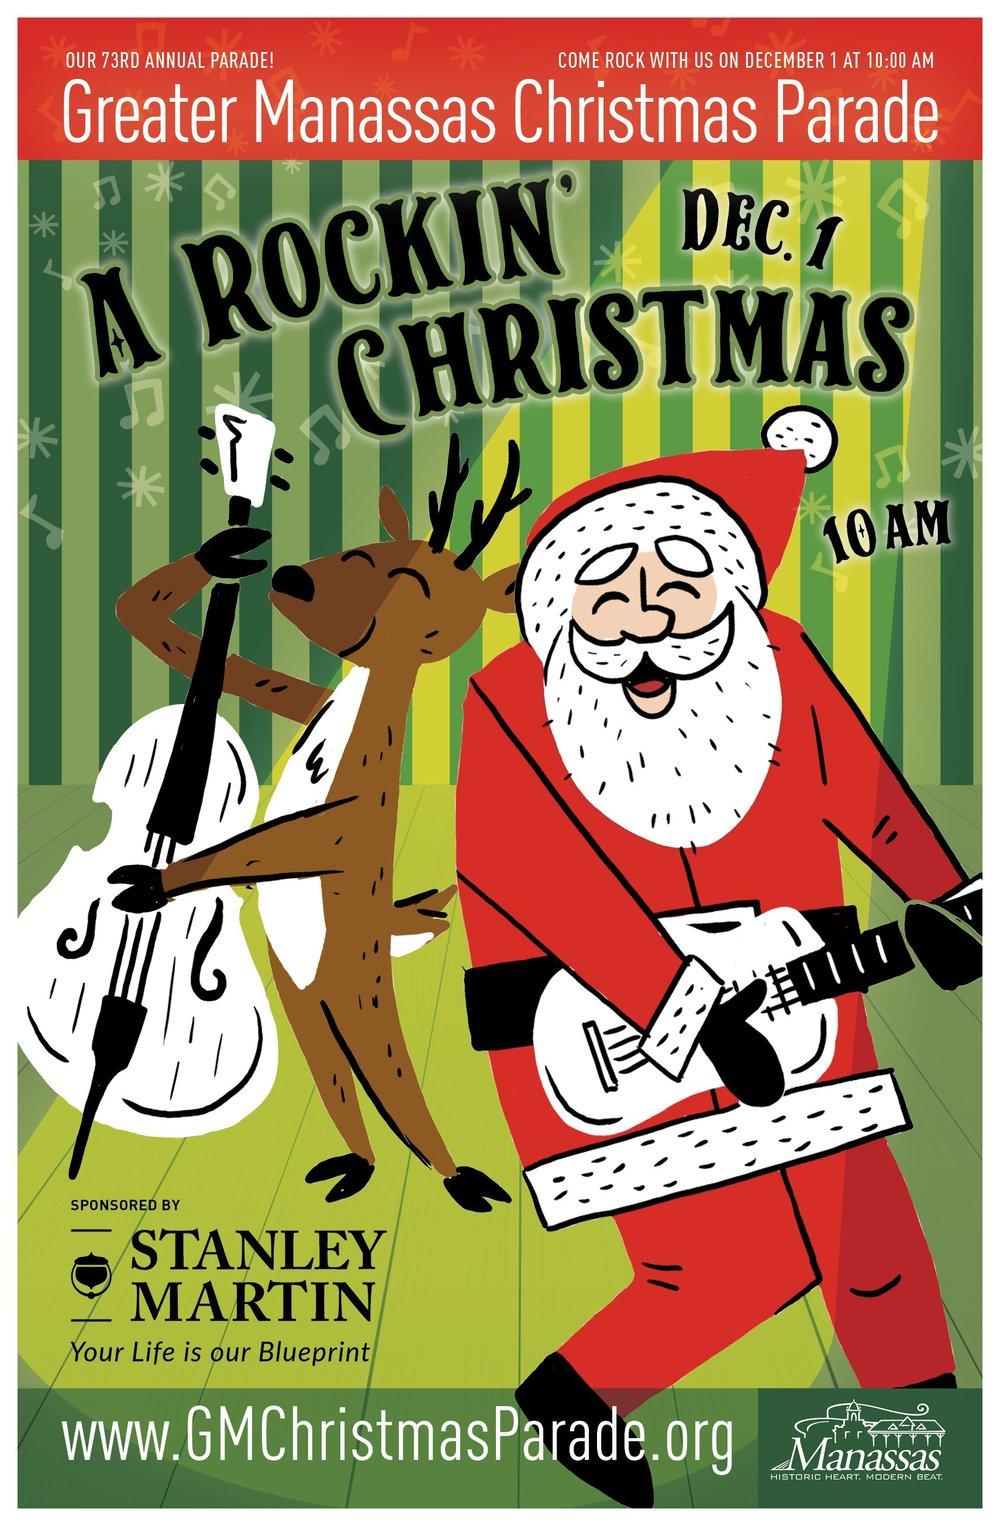 Christmas-Parade-Poster-2018-1-1.jpg